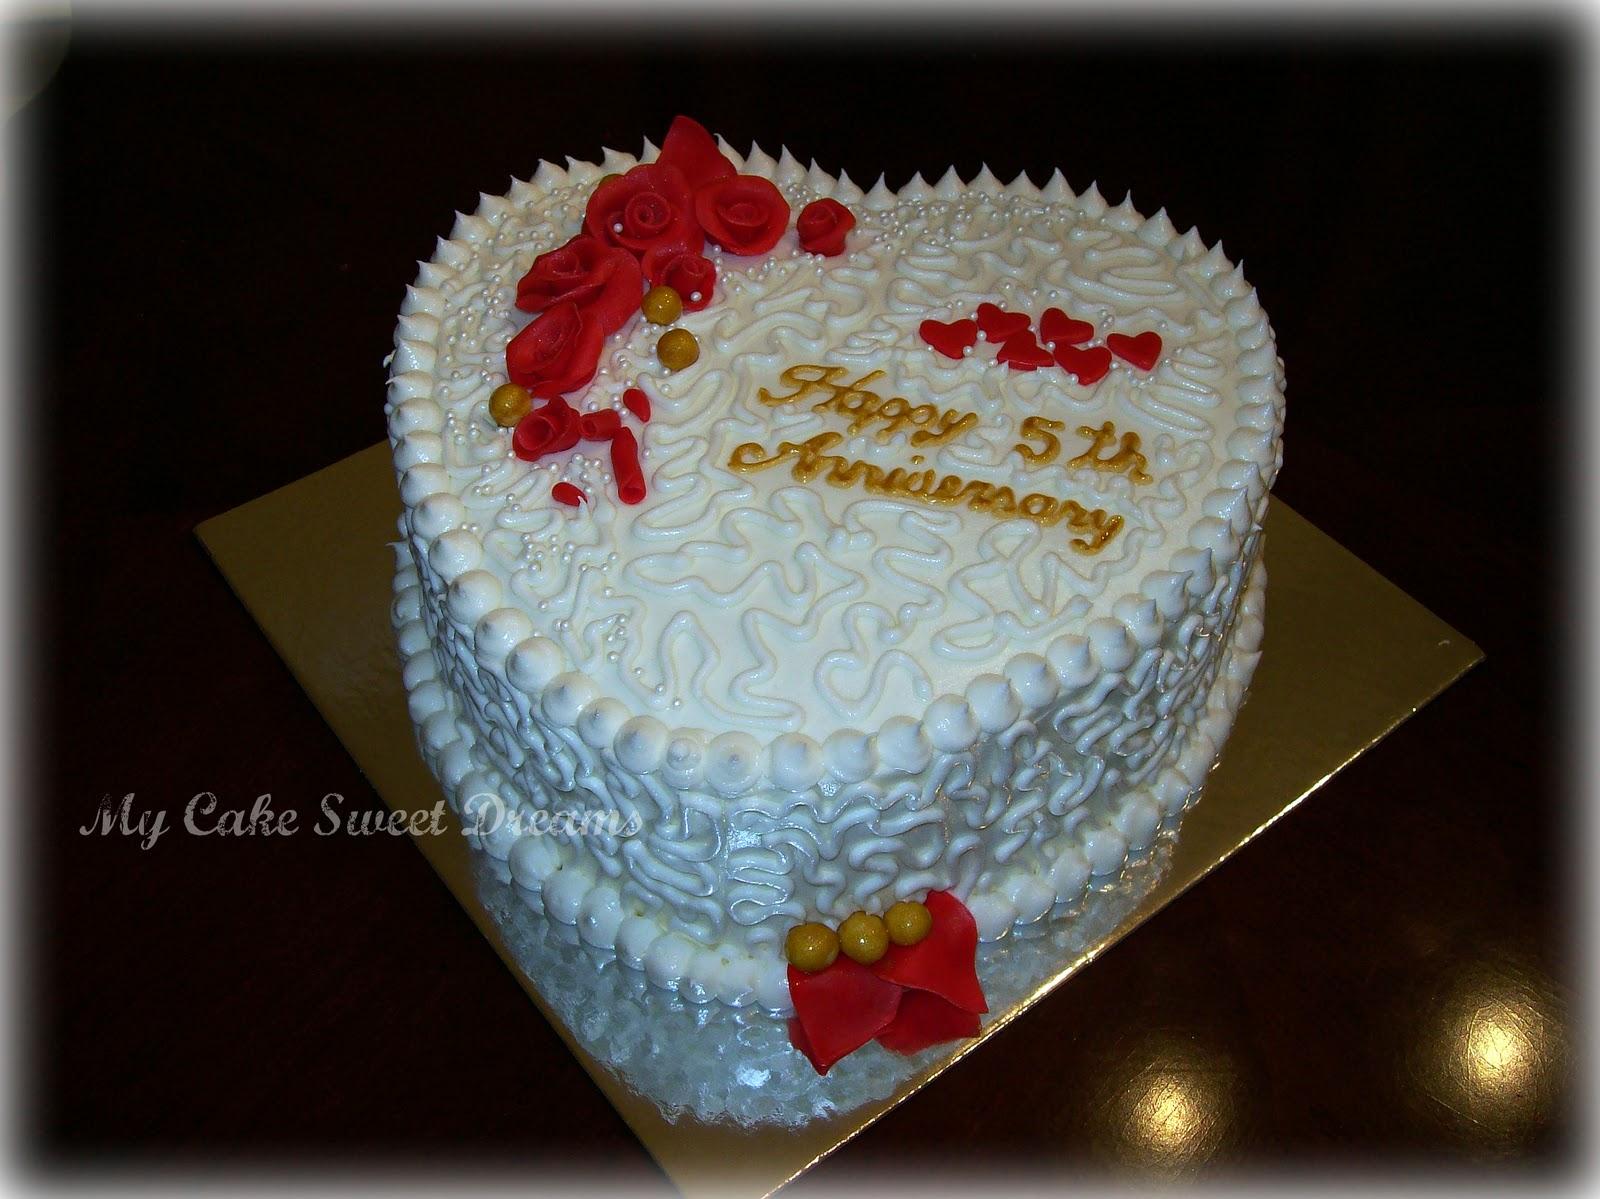 Quot my cake sweet dreams anniversary